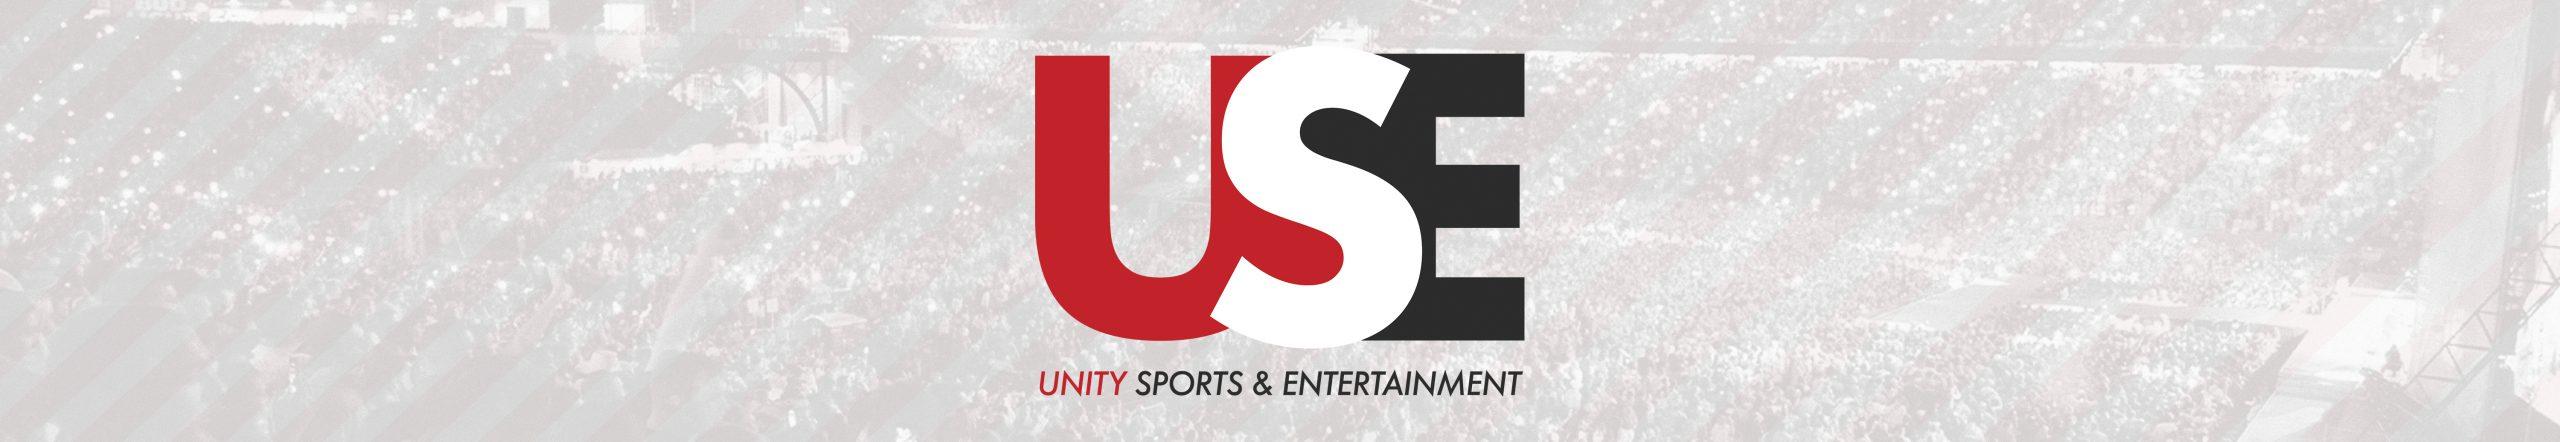 Unity Sports & Entertainment Logo Banner